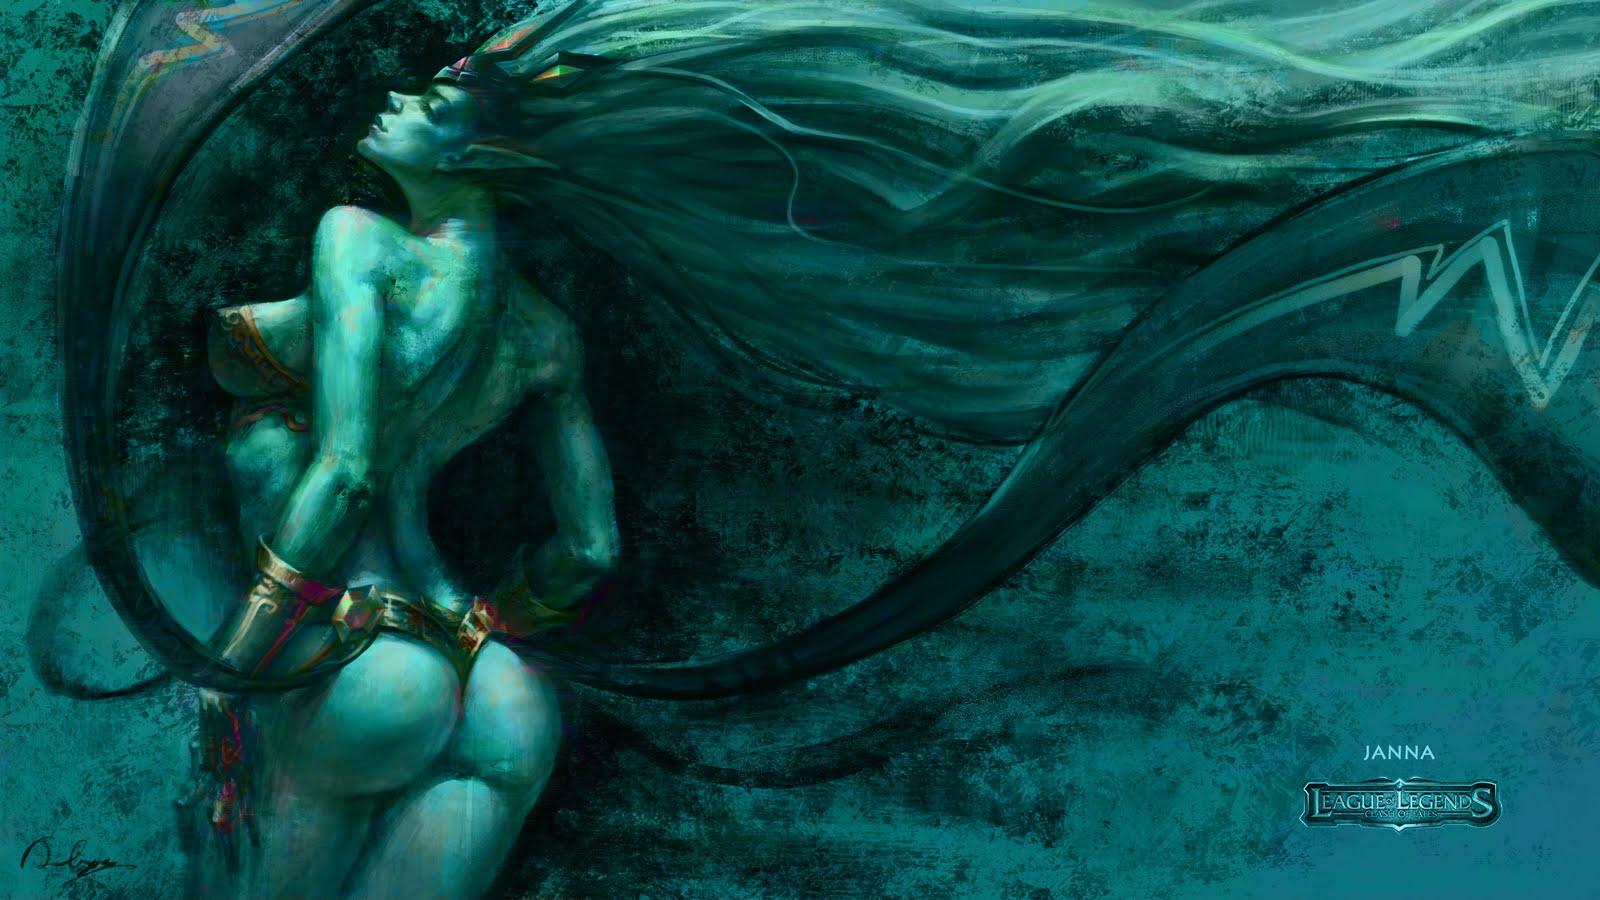 Download Original - Best Fan Art League Of Legends , HD Wallpaper & Backgrounds